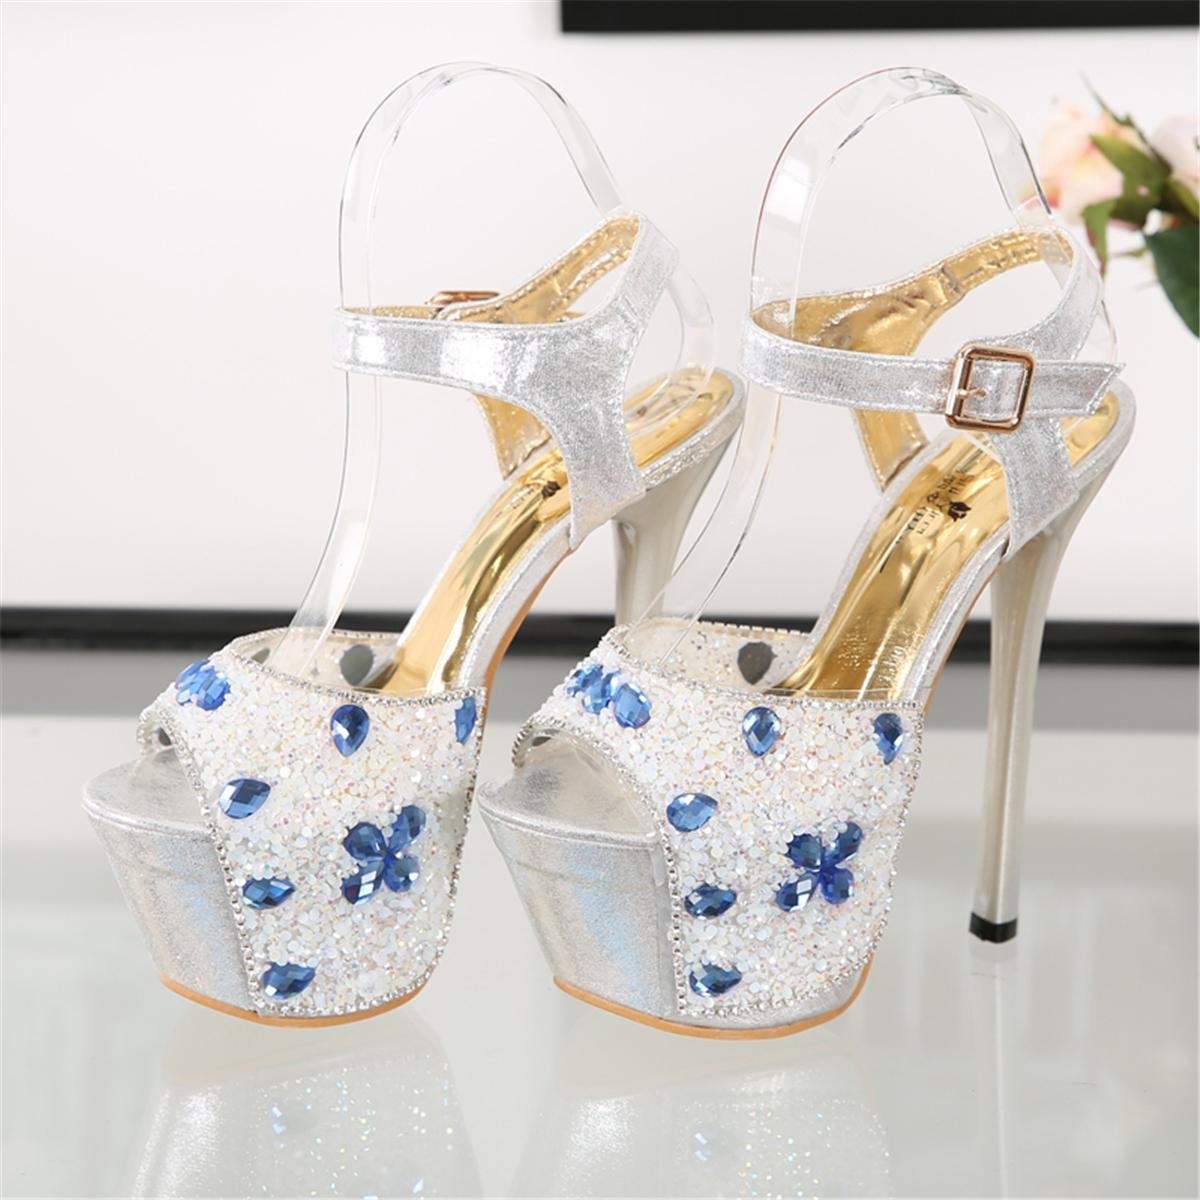 Damen Neue Stiletto Super High Heel Sandalen Schuhe Peep Peep Schuhe Toe Plattform Satin Diamant Chiffon Blume Frühling Frühling Club Party Nachtclub Blau 668982